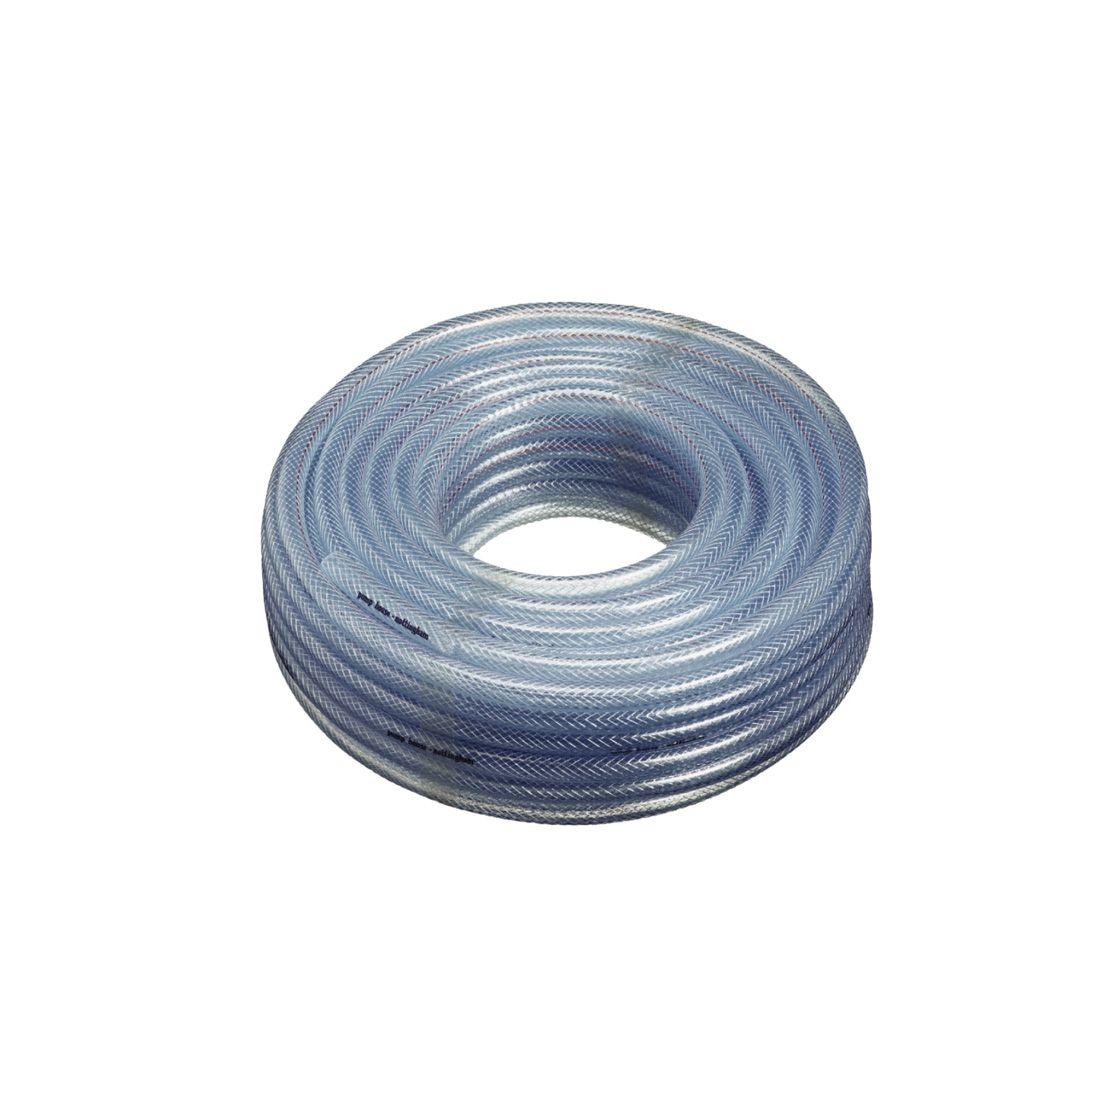 Flexible Plastic Air Tubing 10mm Bore Garden Reinforced CLEAR PVC Braided Hose